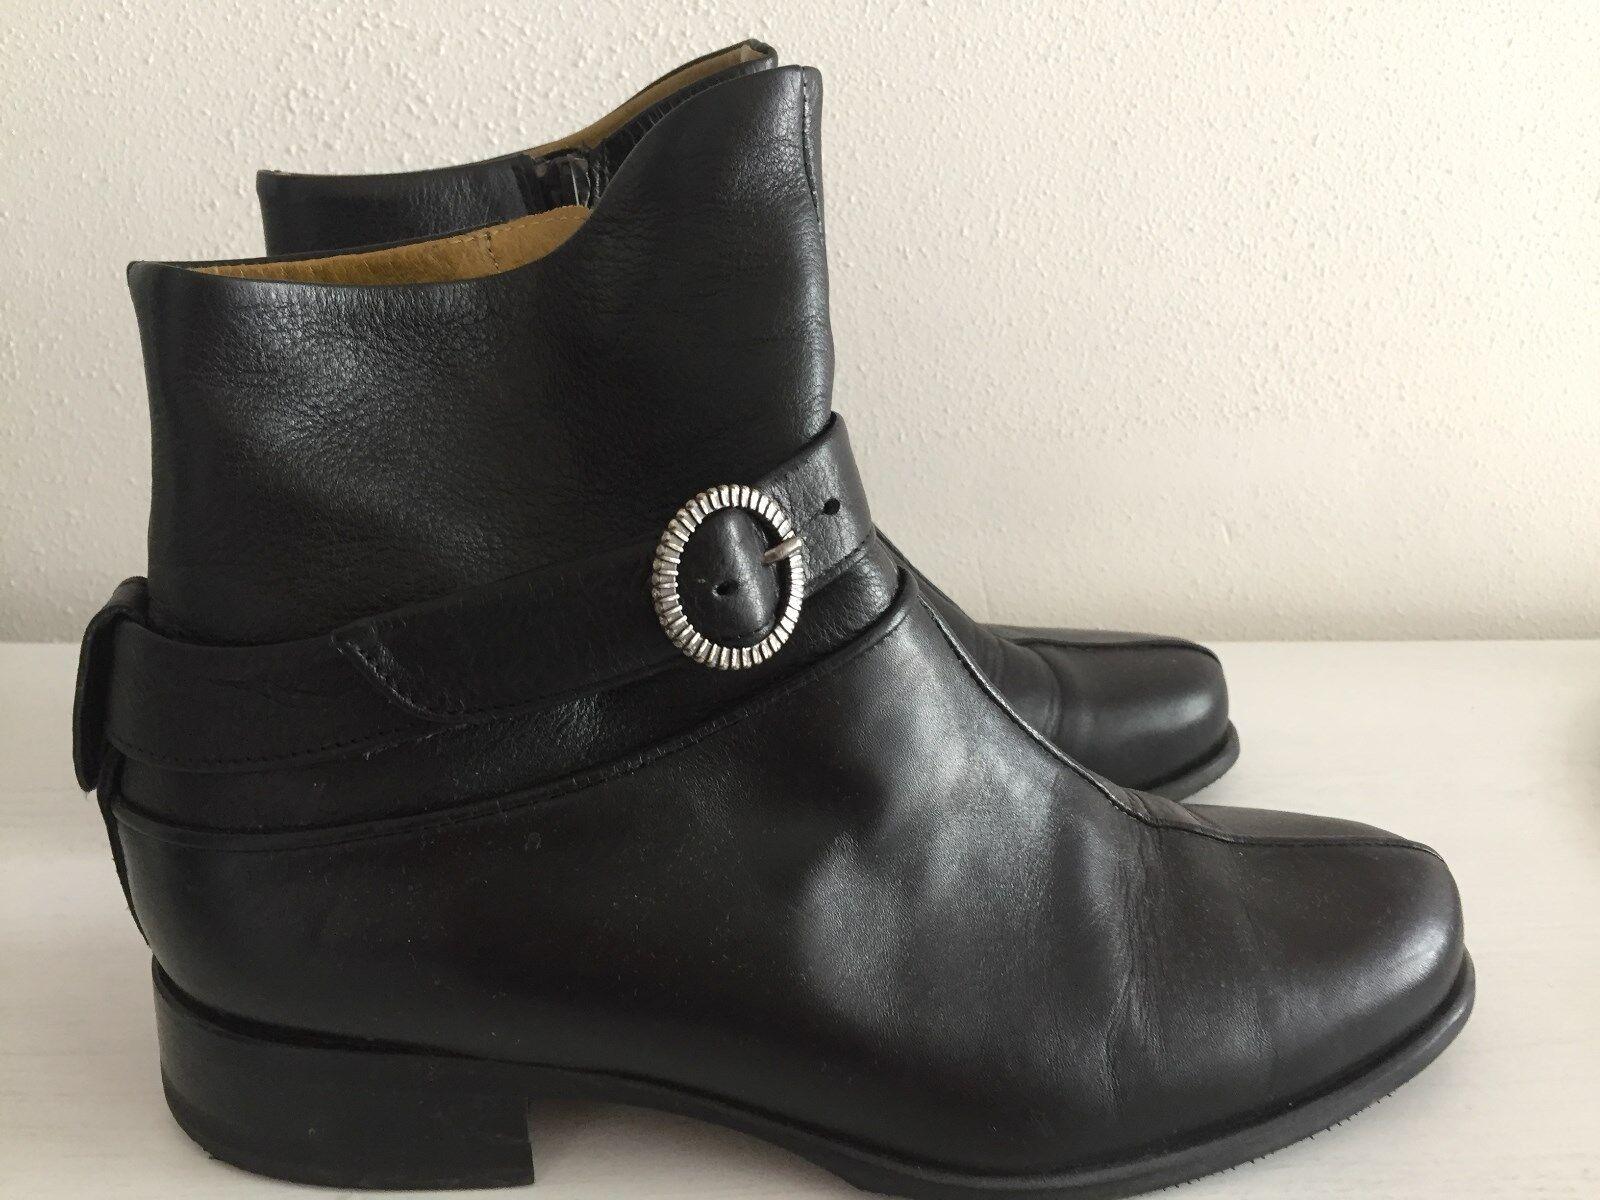 Vabene Stiefel Stiefeletten schwarz Leder Gr. 38 herausnehmbare Innensohle